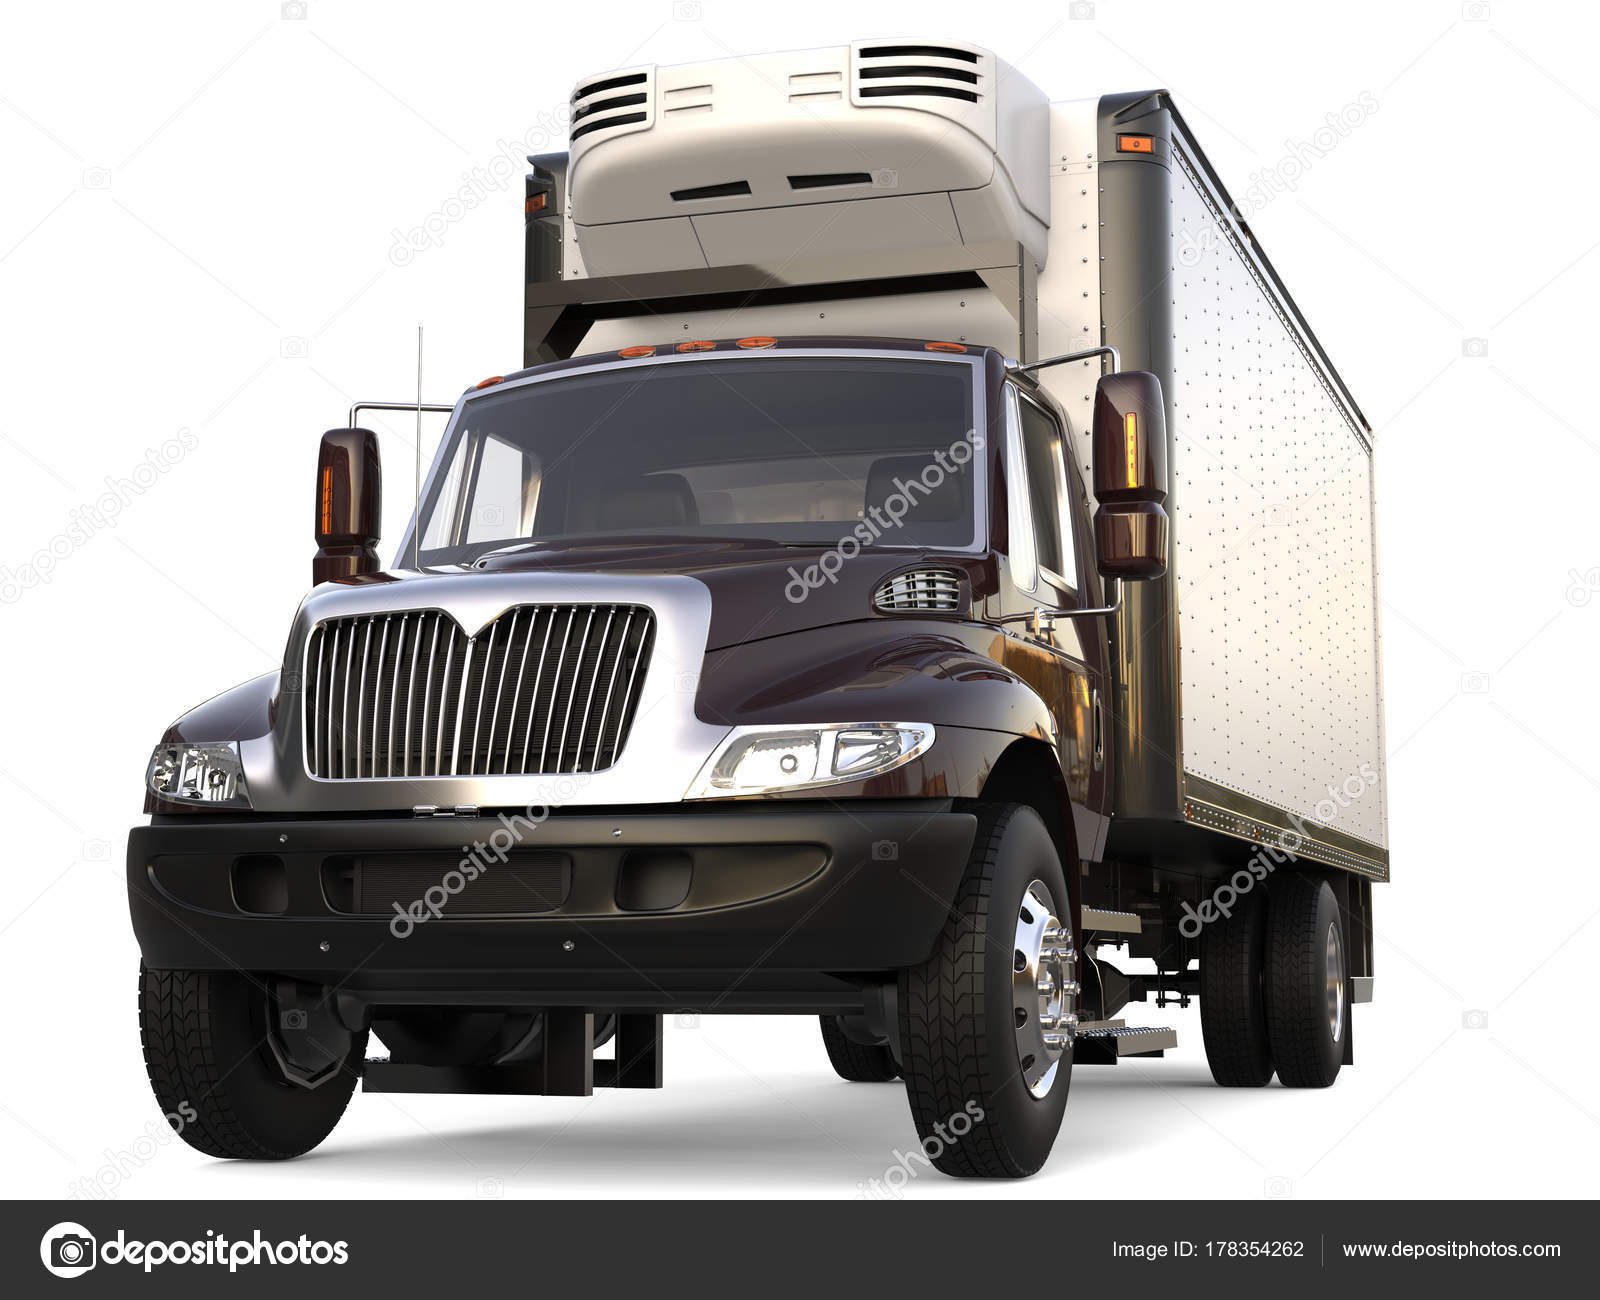 Amerikanischer Kühlschrank Transportieren : Dunkel braun kühlschrank lkw ladung closeup erschossen u stockfoto